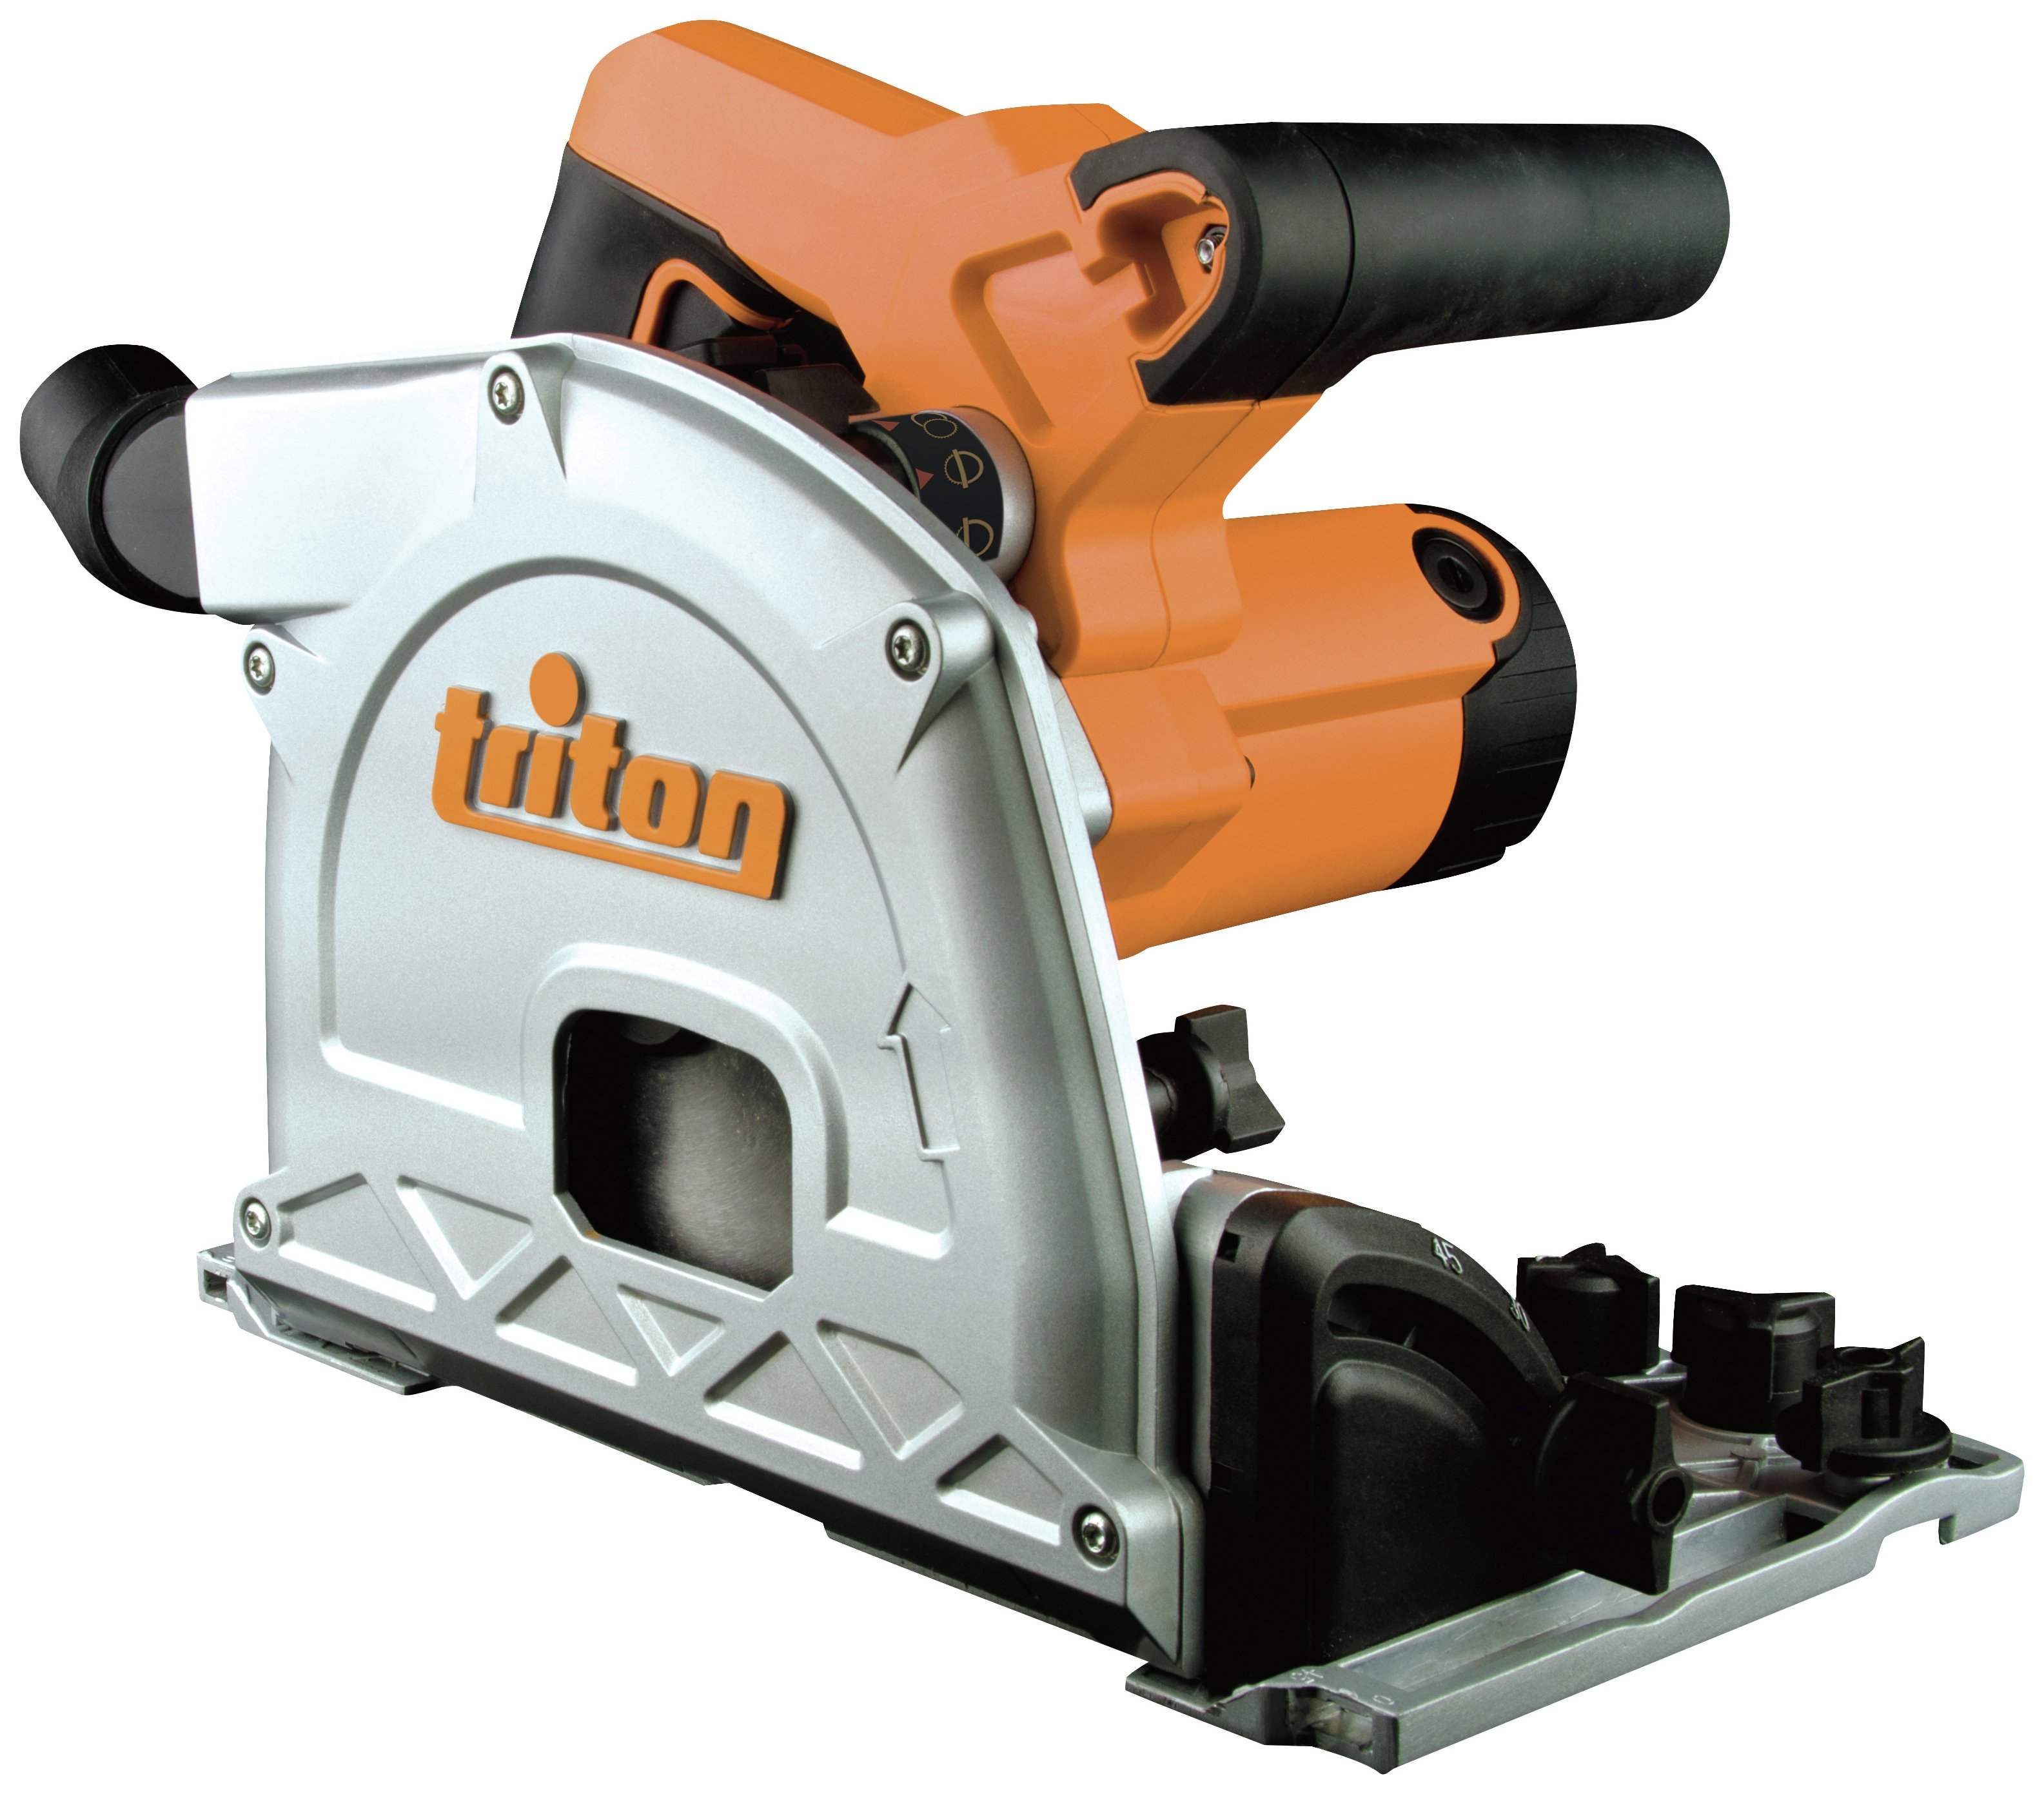 Triton Plunge Track Saw - 1400W